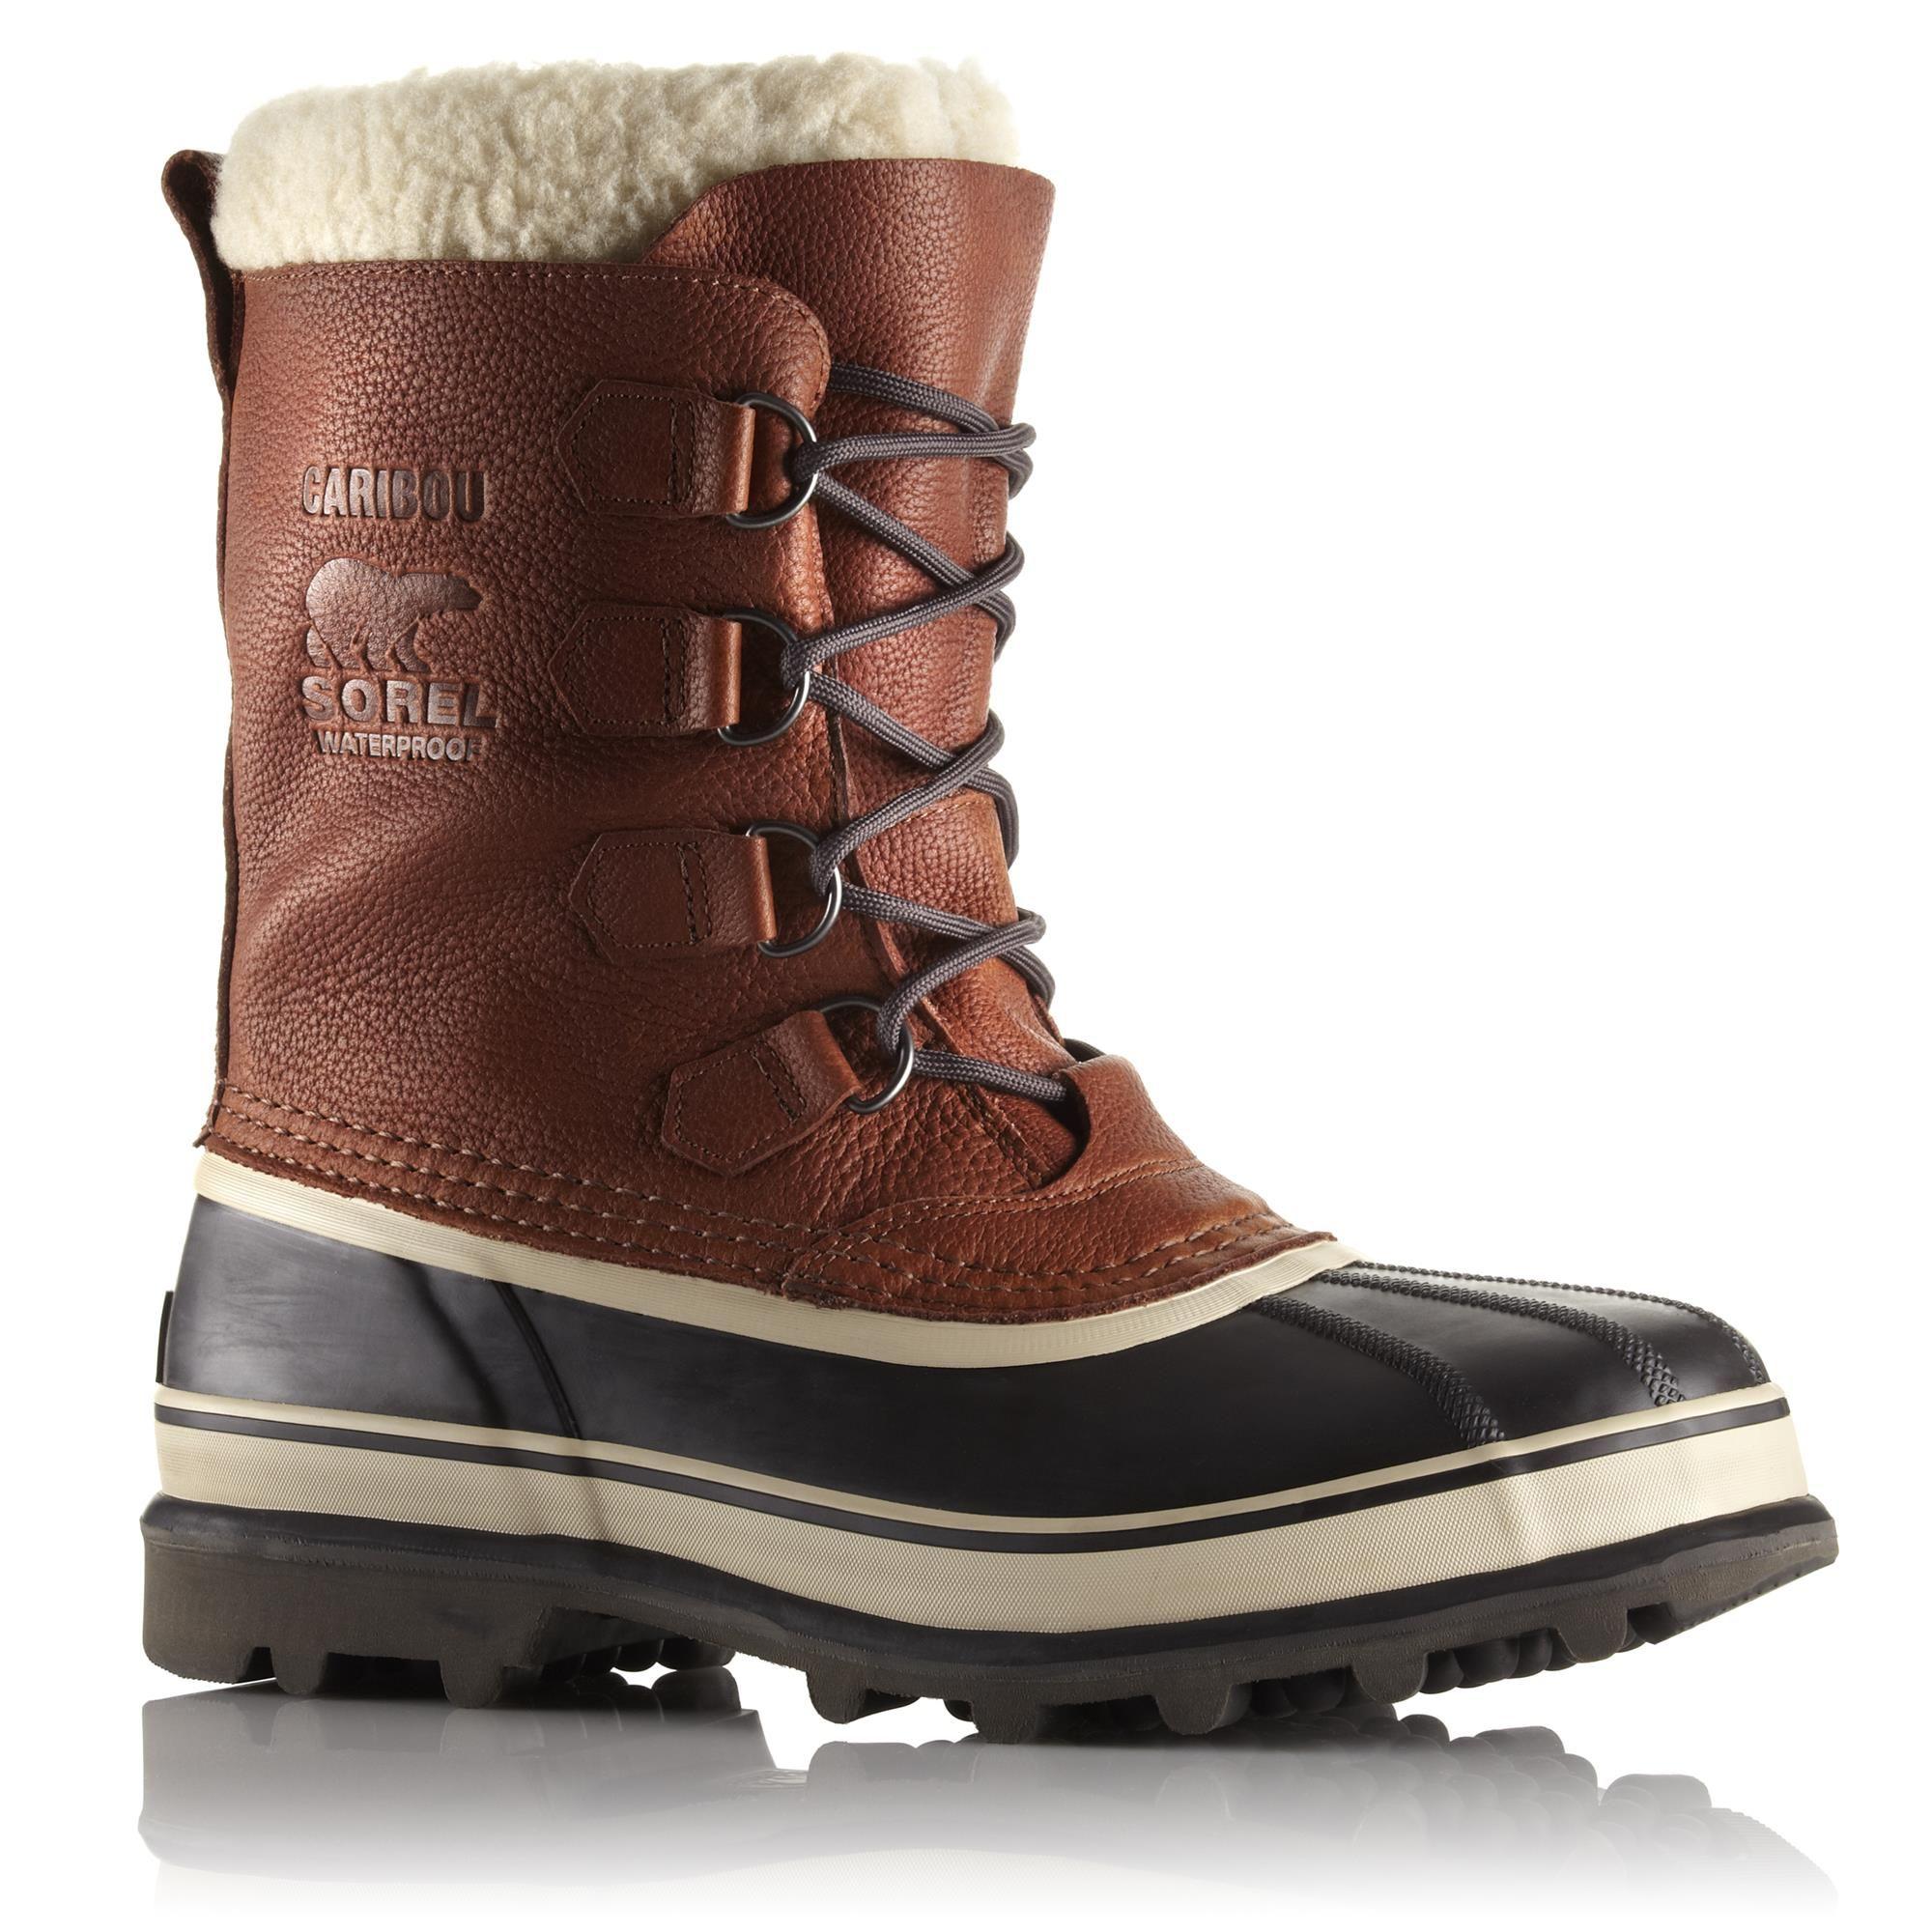 cf5bae8bc8f4d Xtend-Angebote Sorel Caribou Wool men Winterstiefel Herren braun Gr. 44,0 EU